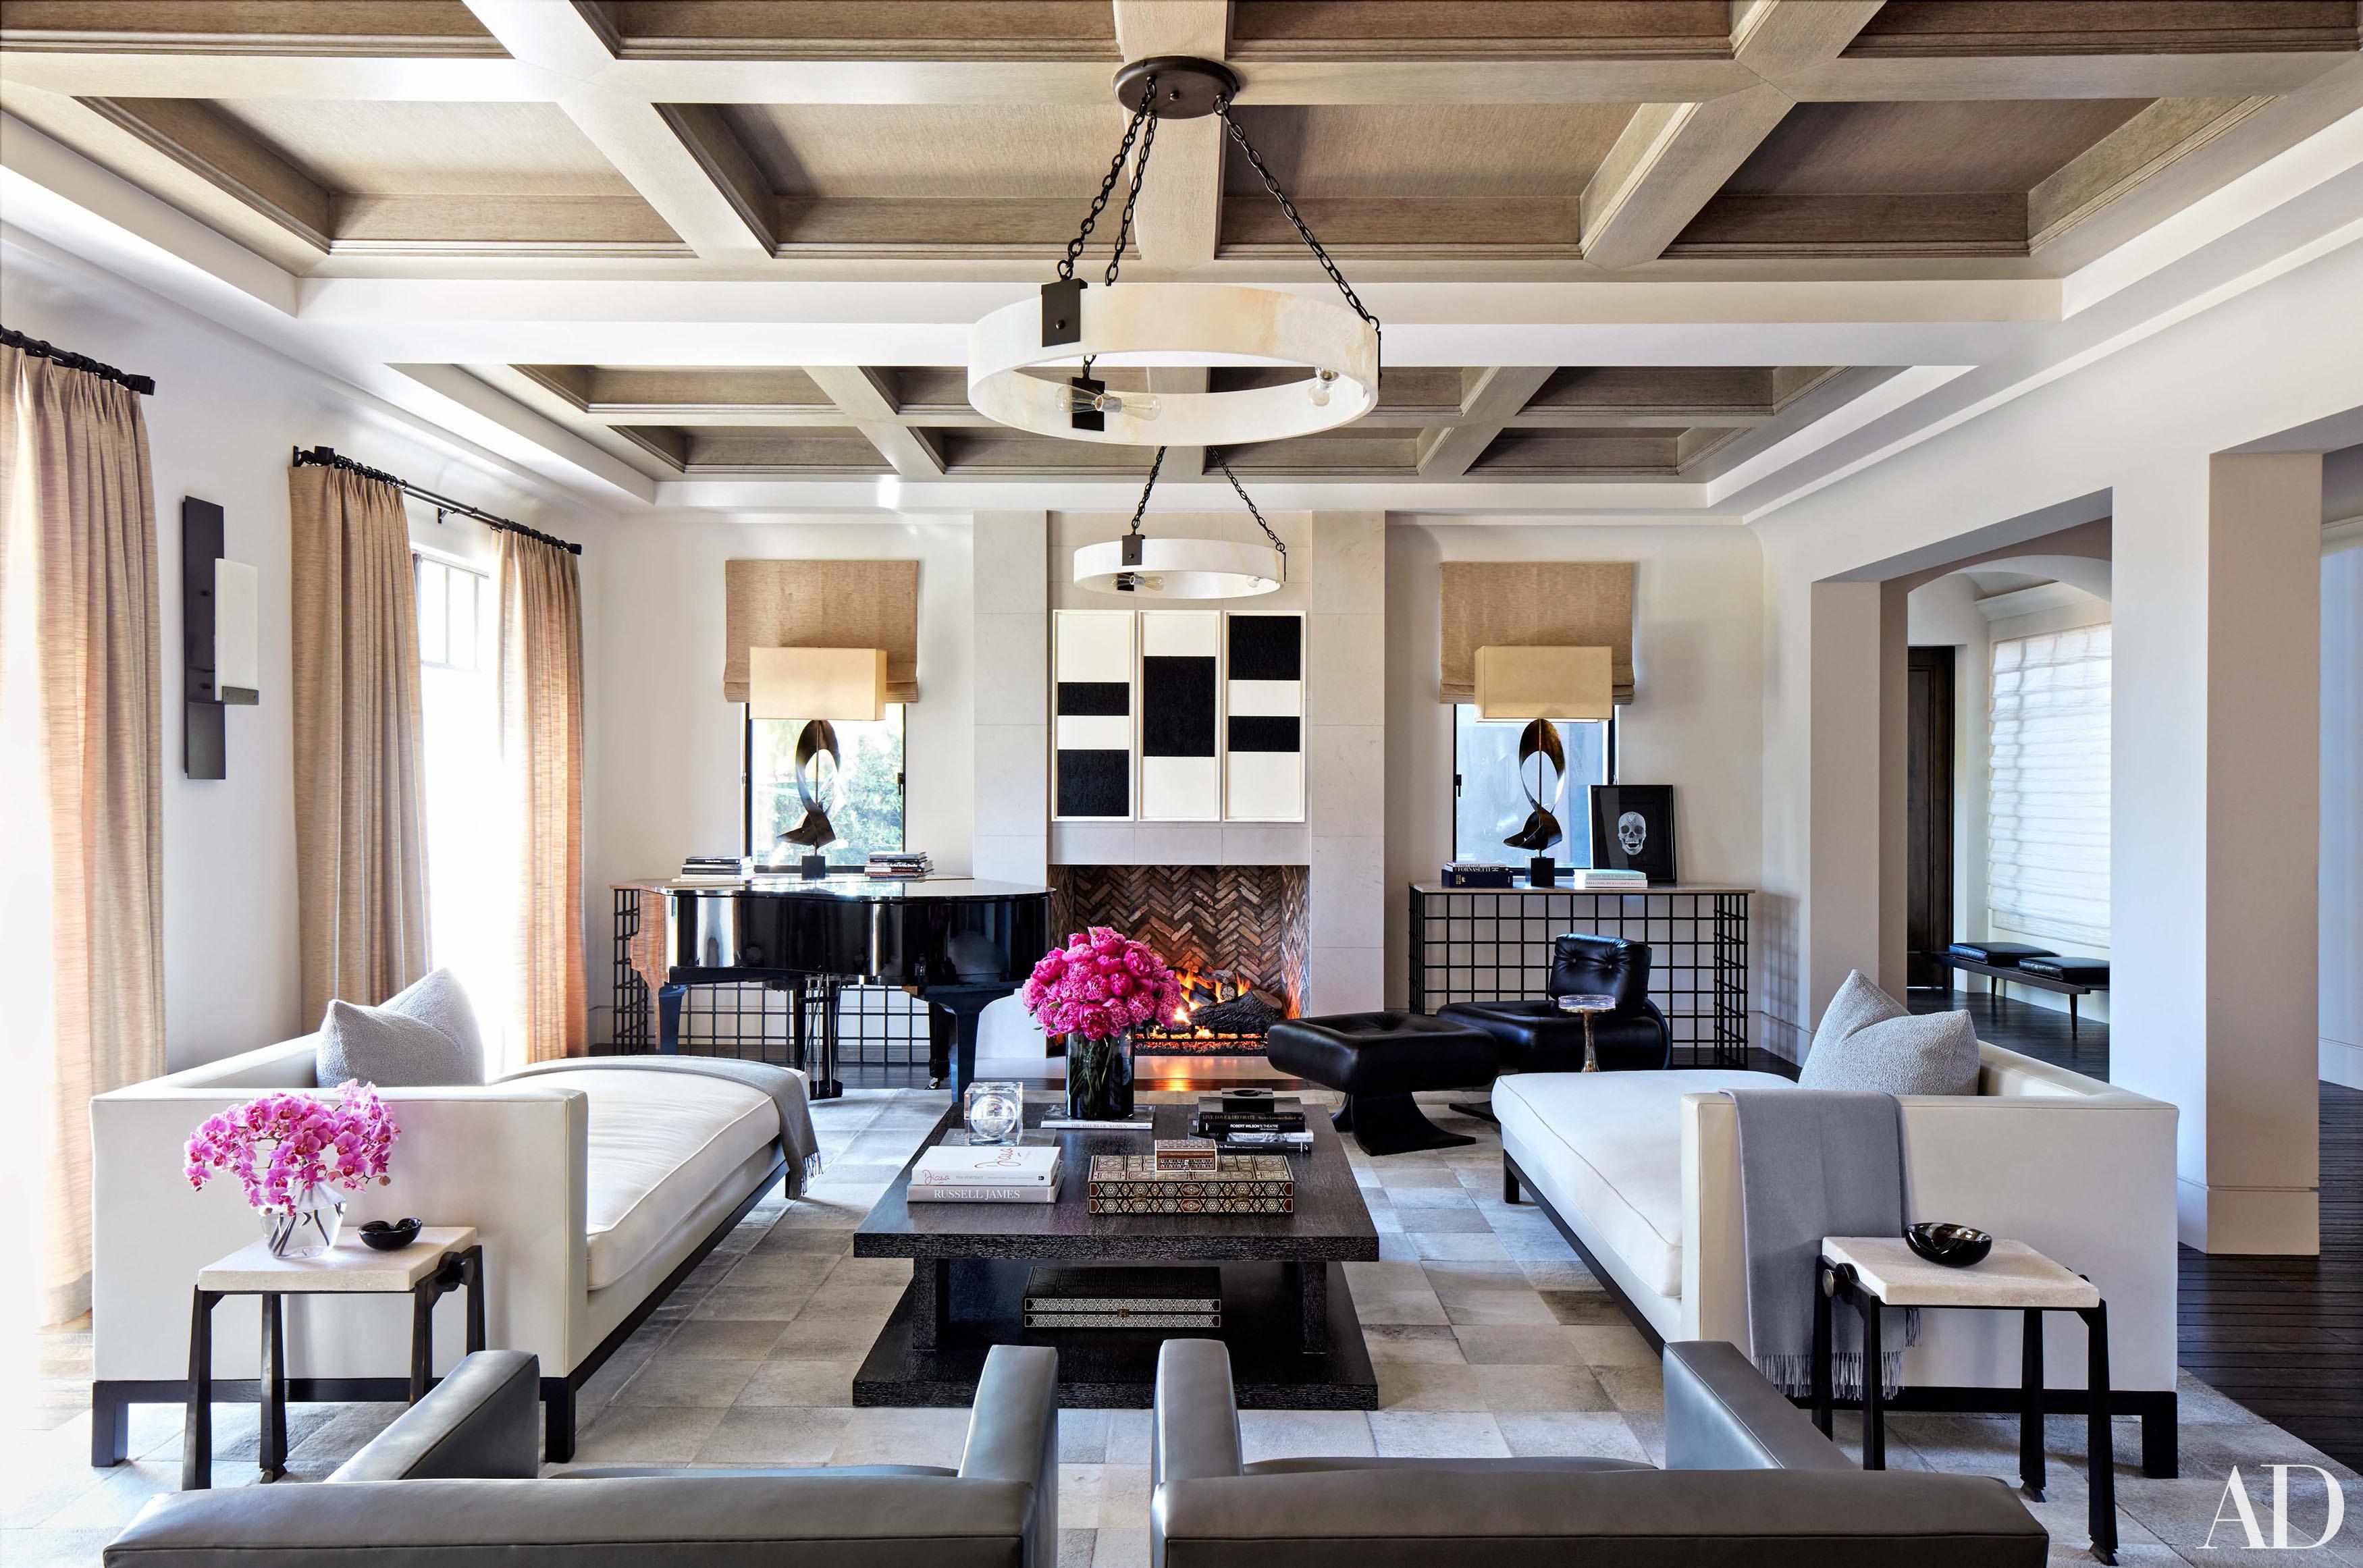 Visite privée  la maison de Kourtney Kardashian à Calbasas